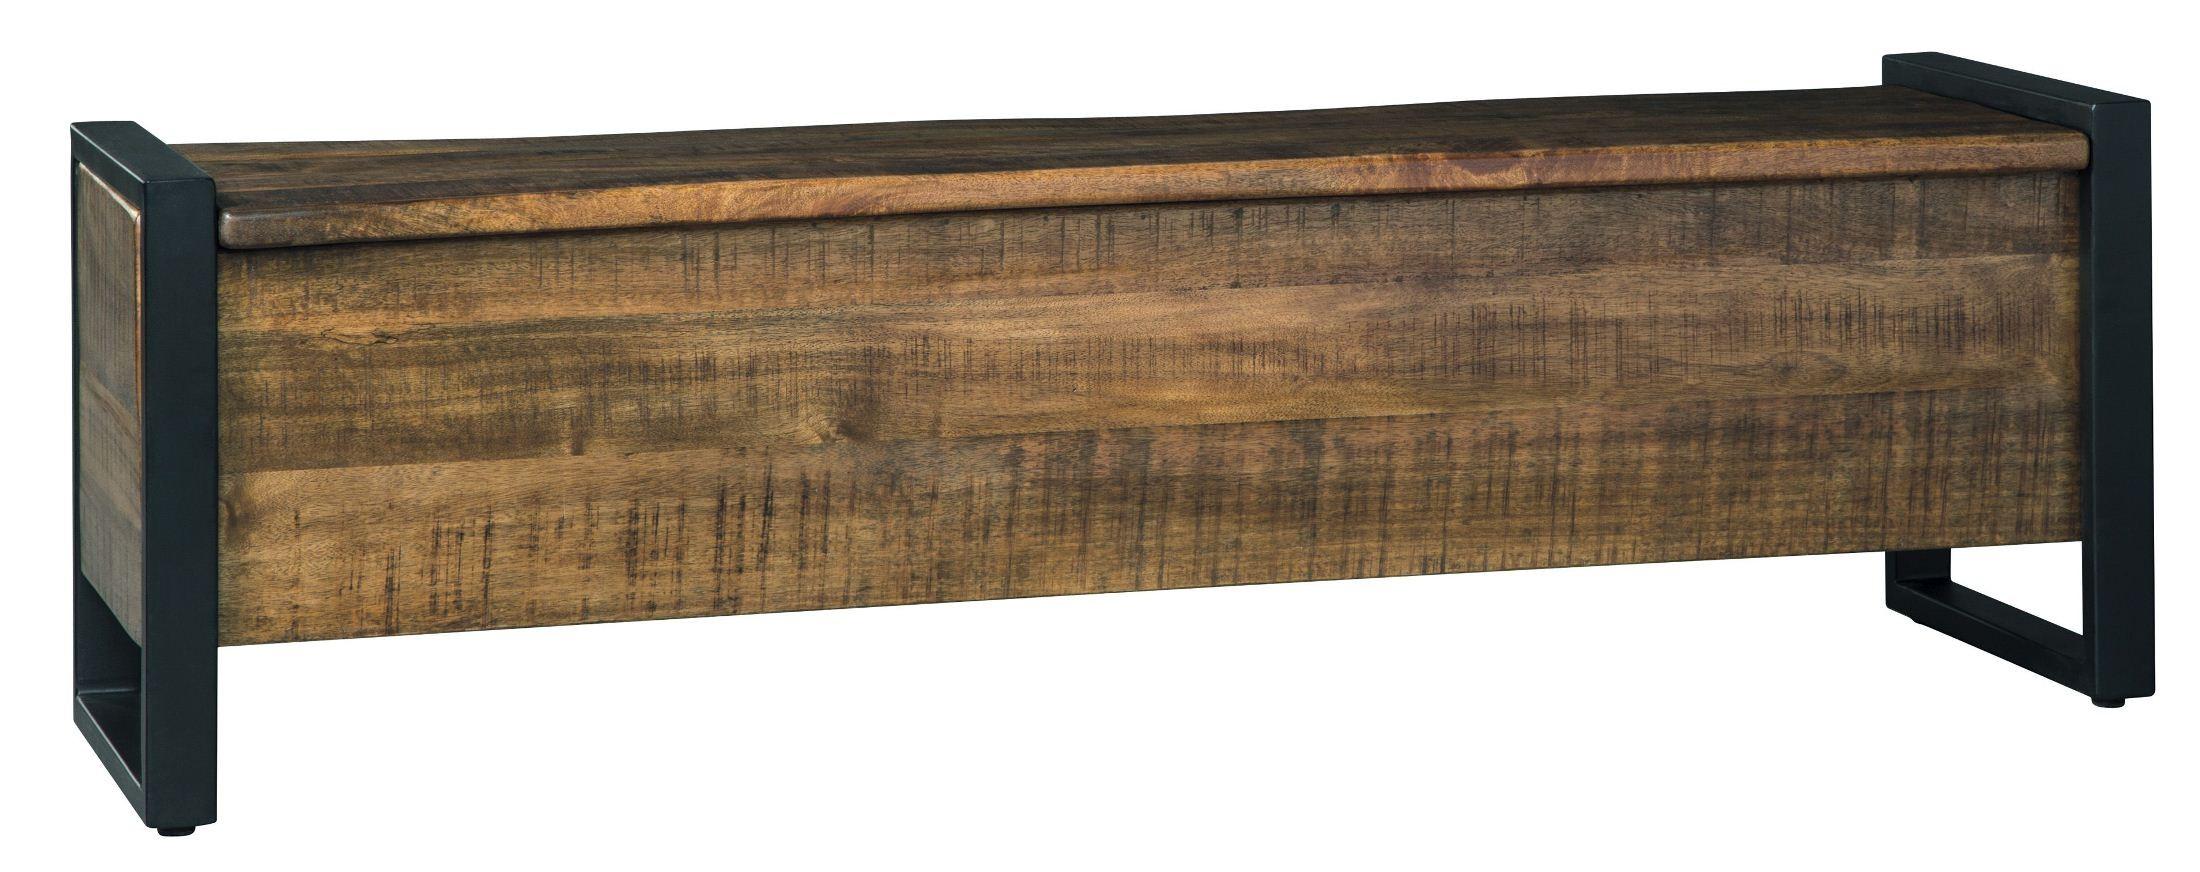 Glosco Light Brown Storage Bench From Ashley Coleman Furniture